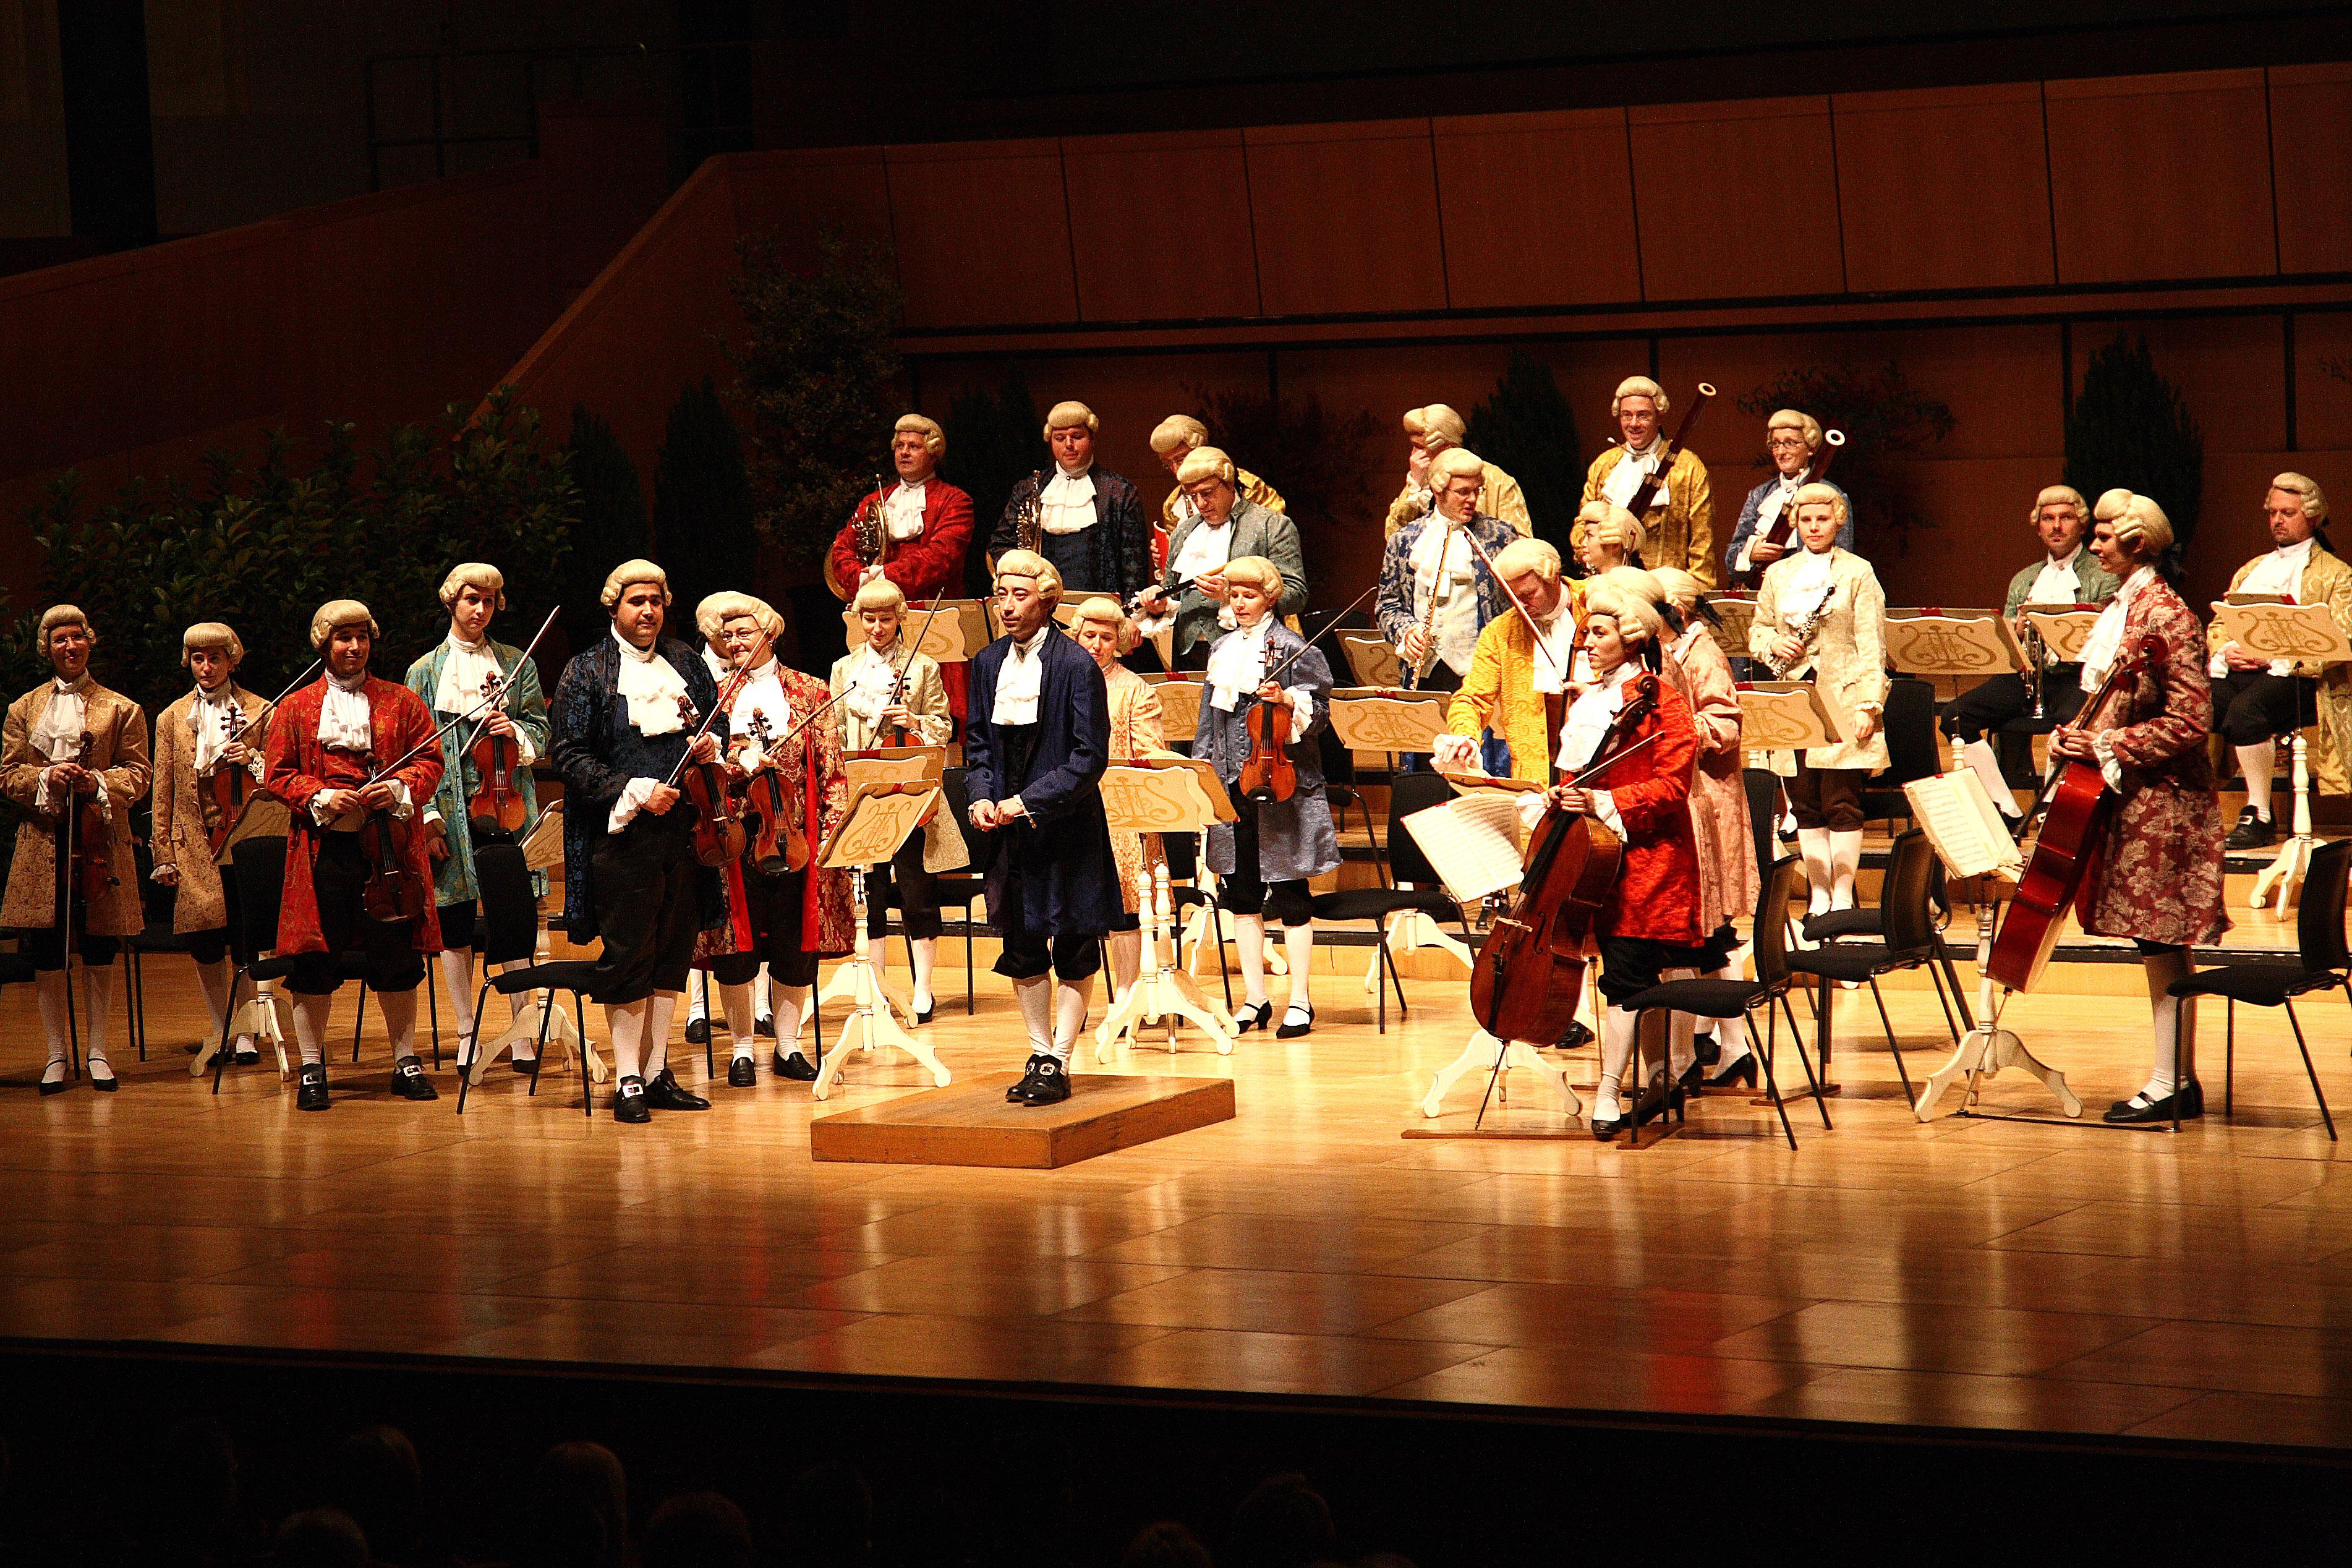 Vienna Classical Music Tour